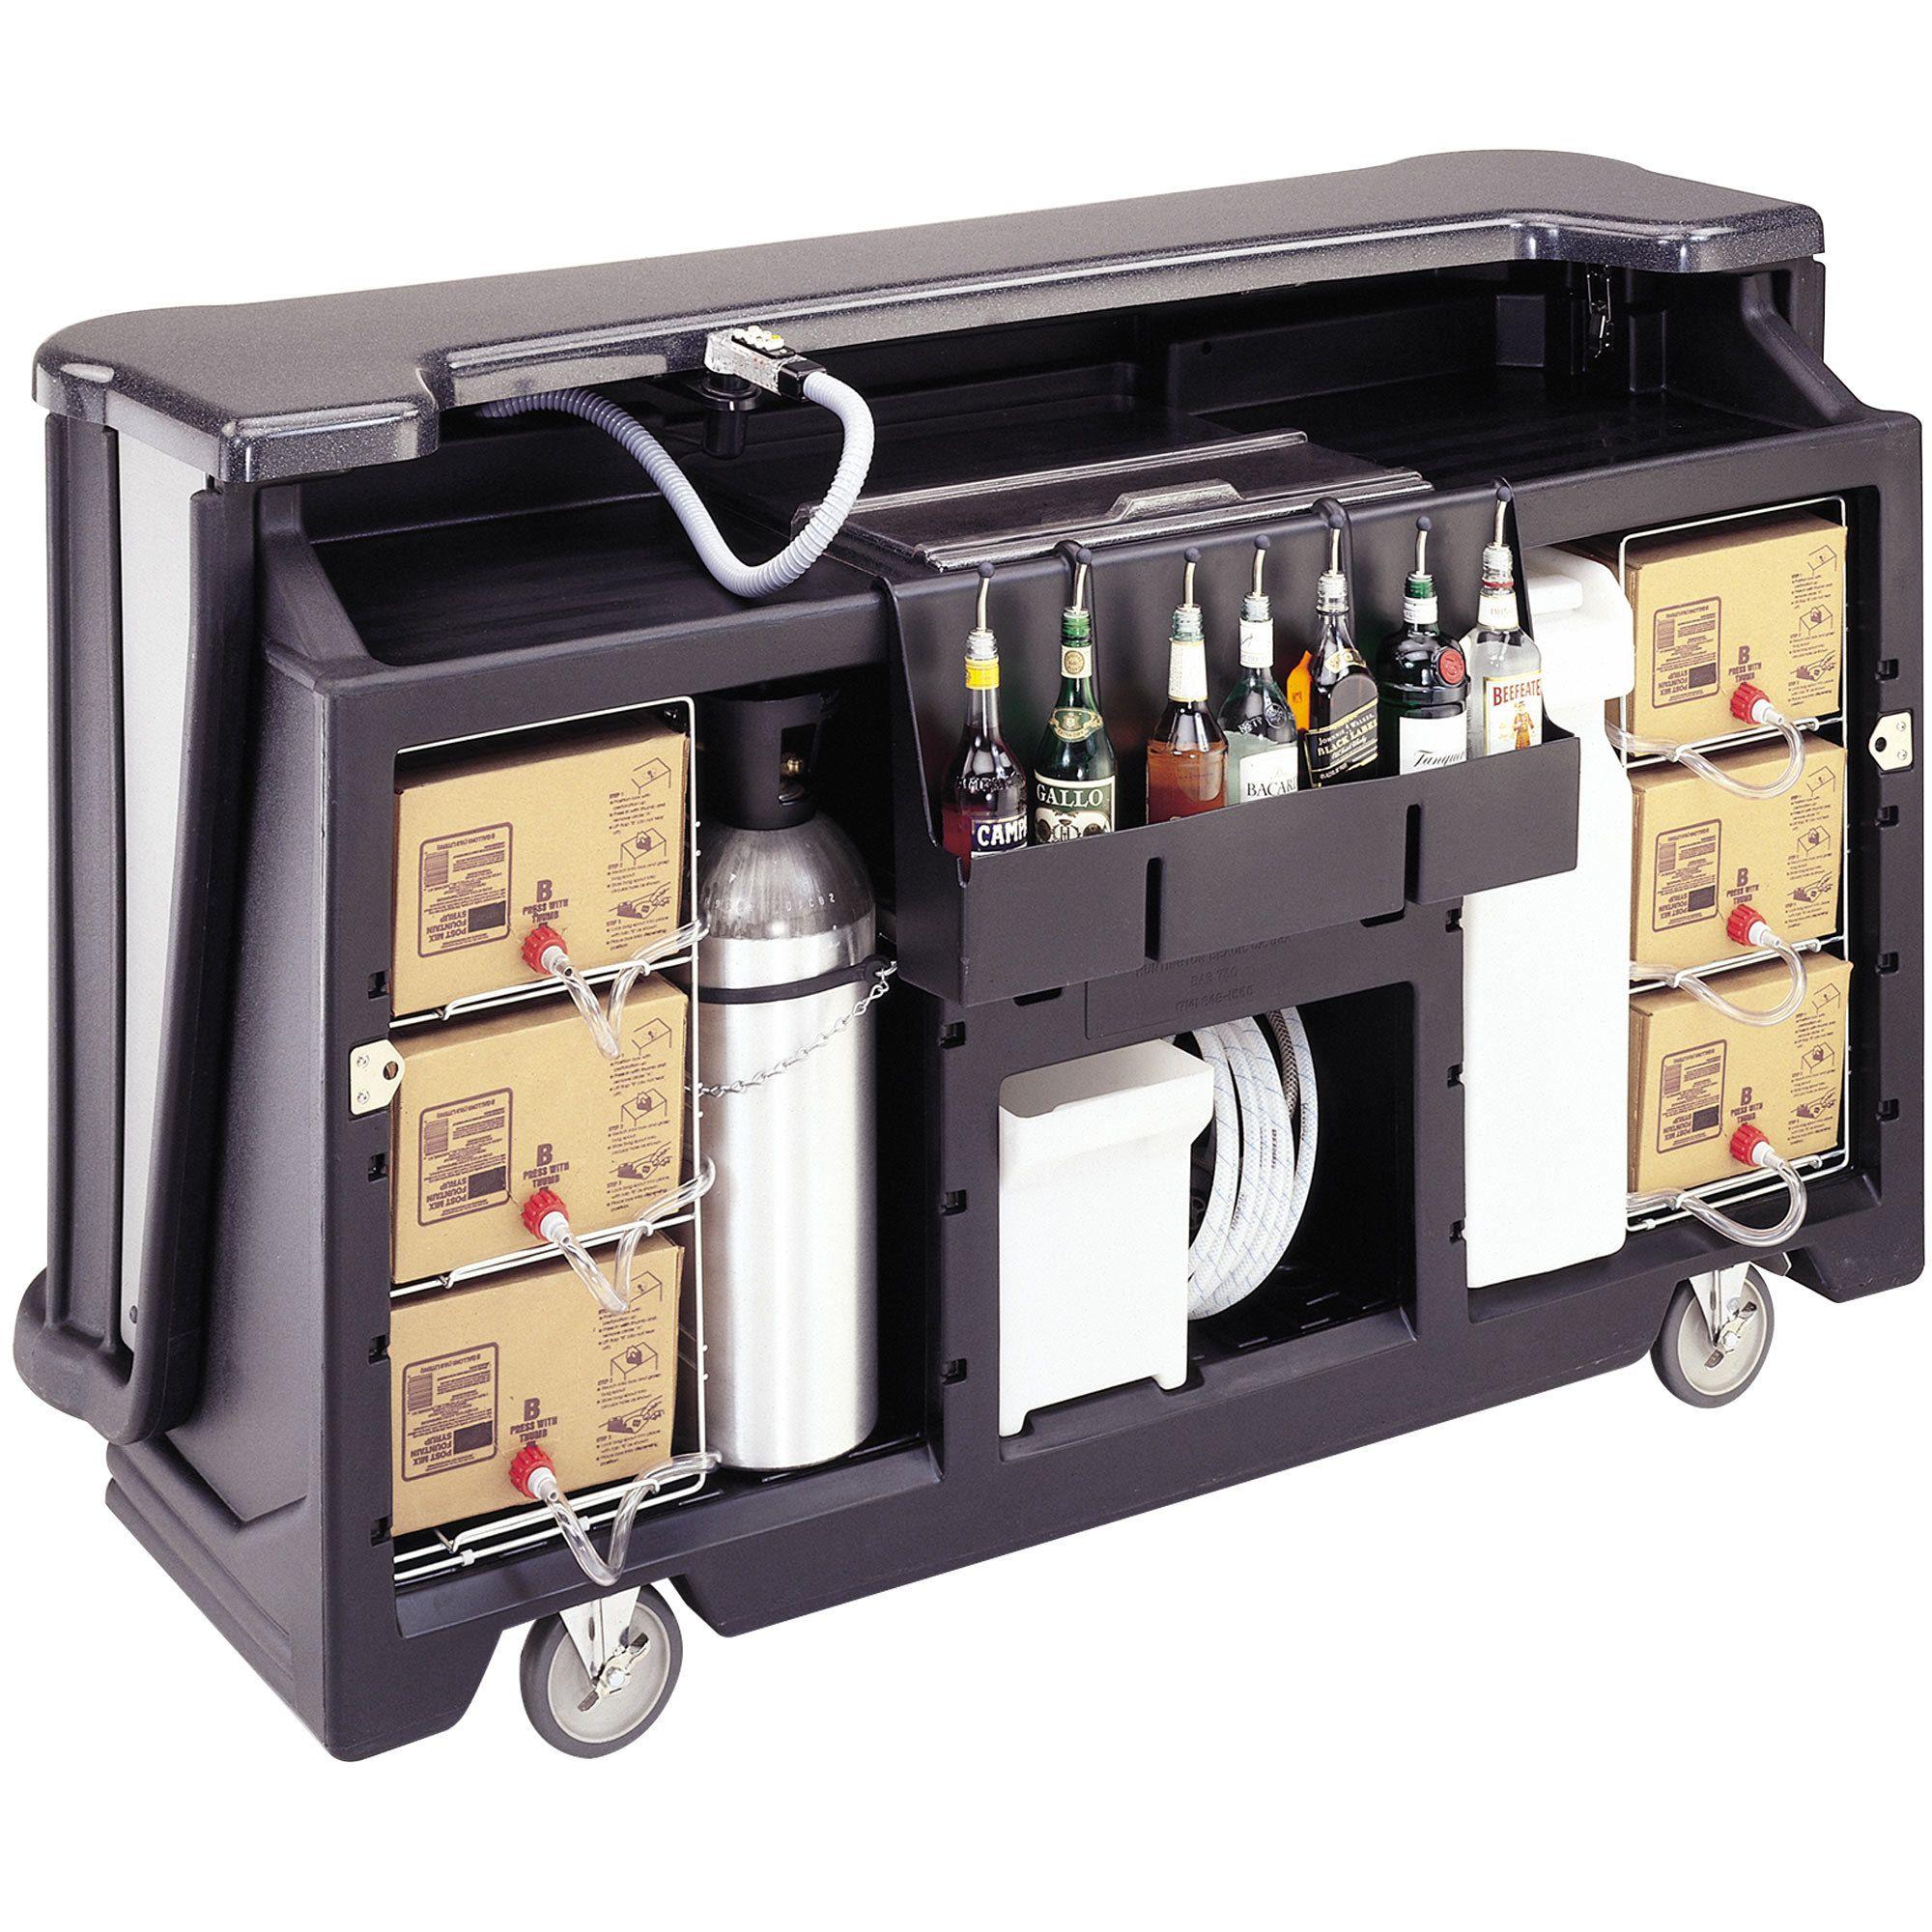 Rack For Bar730 Portable Bars